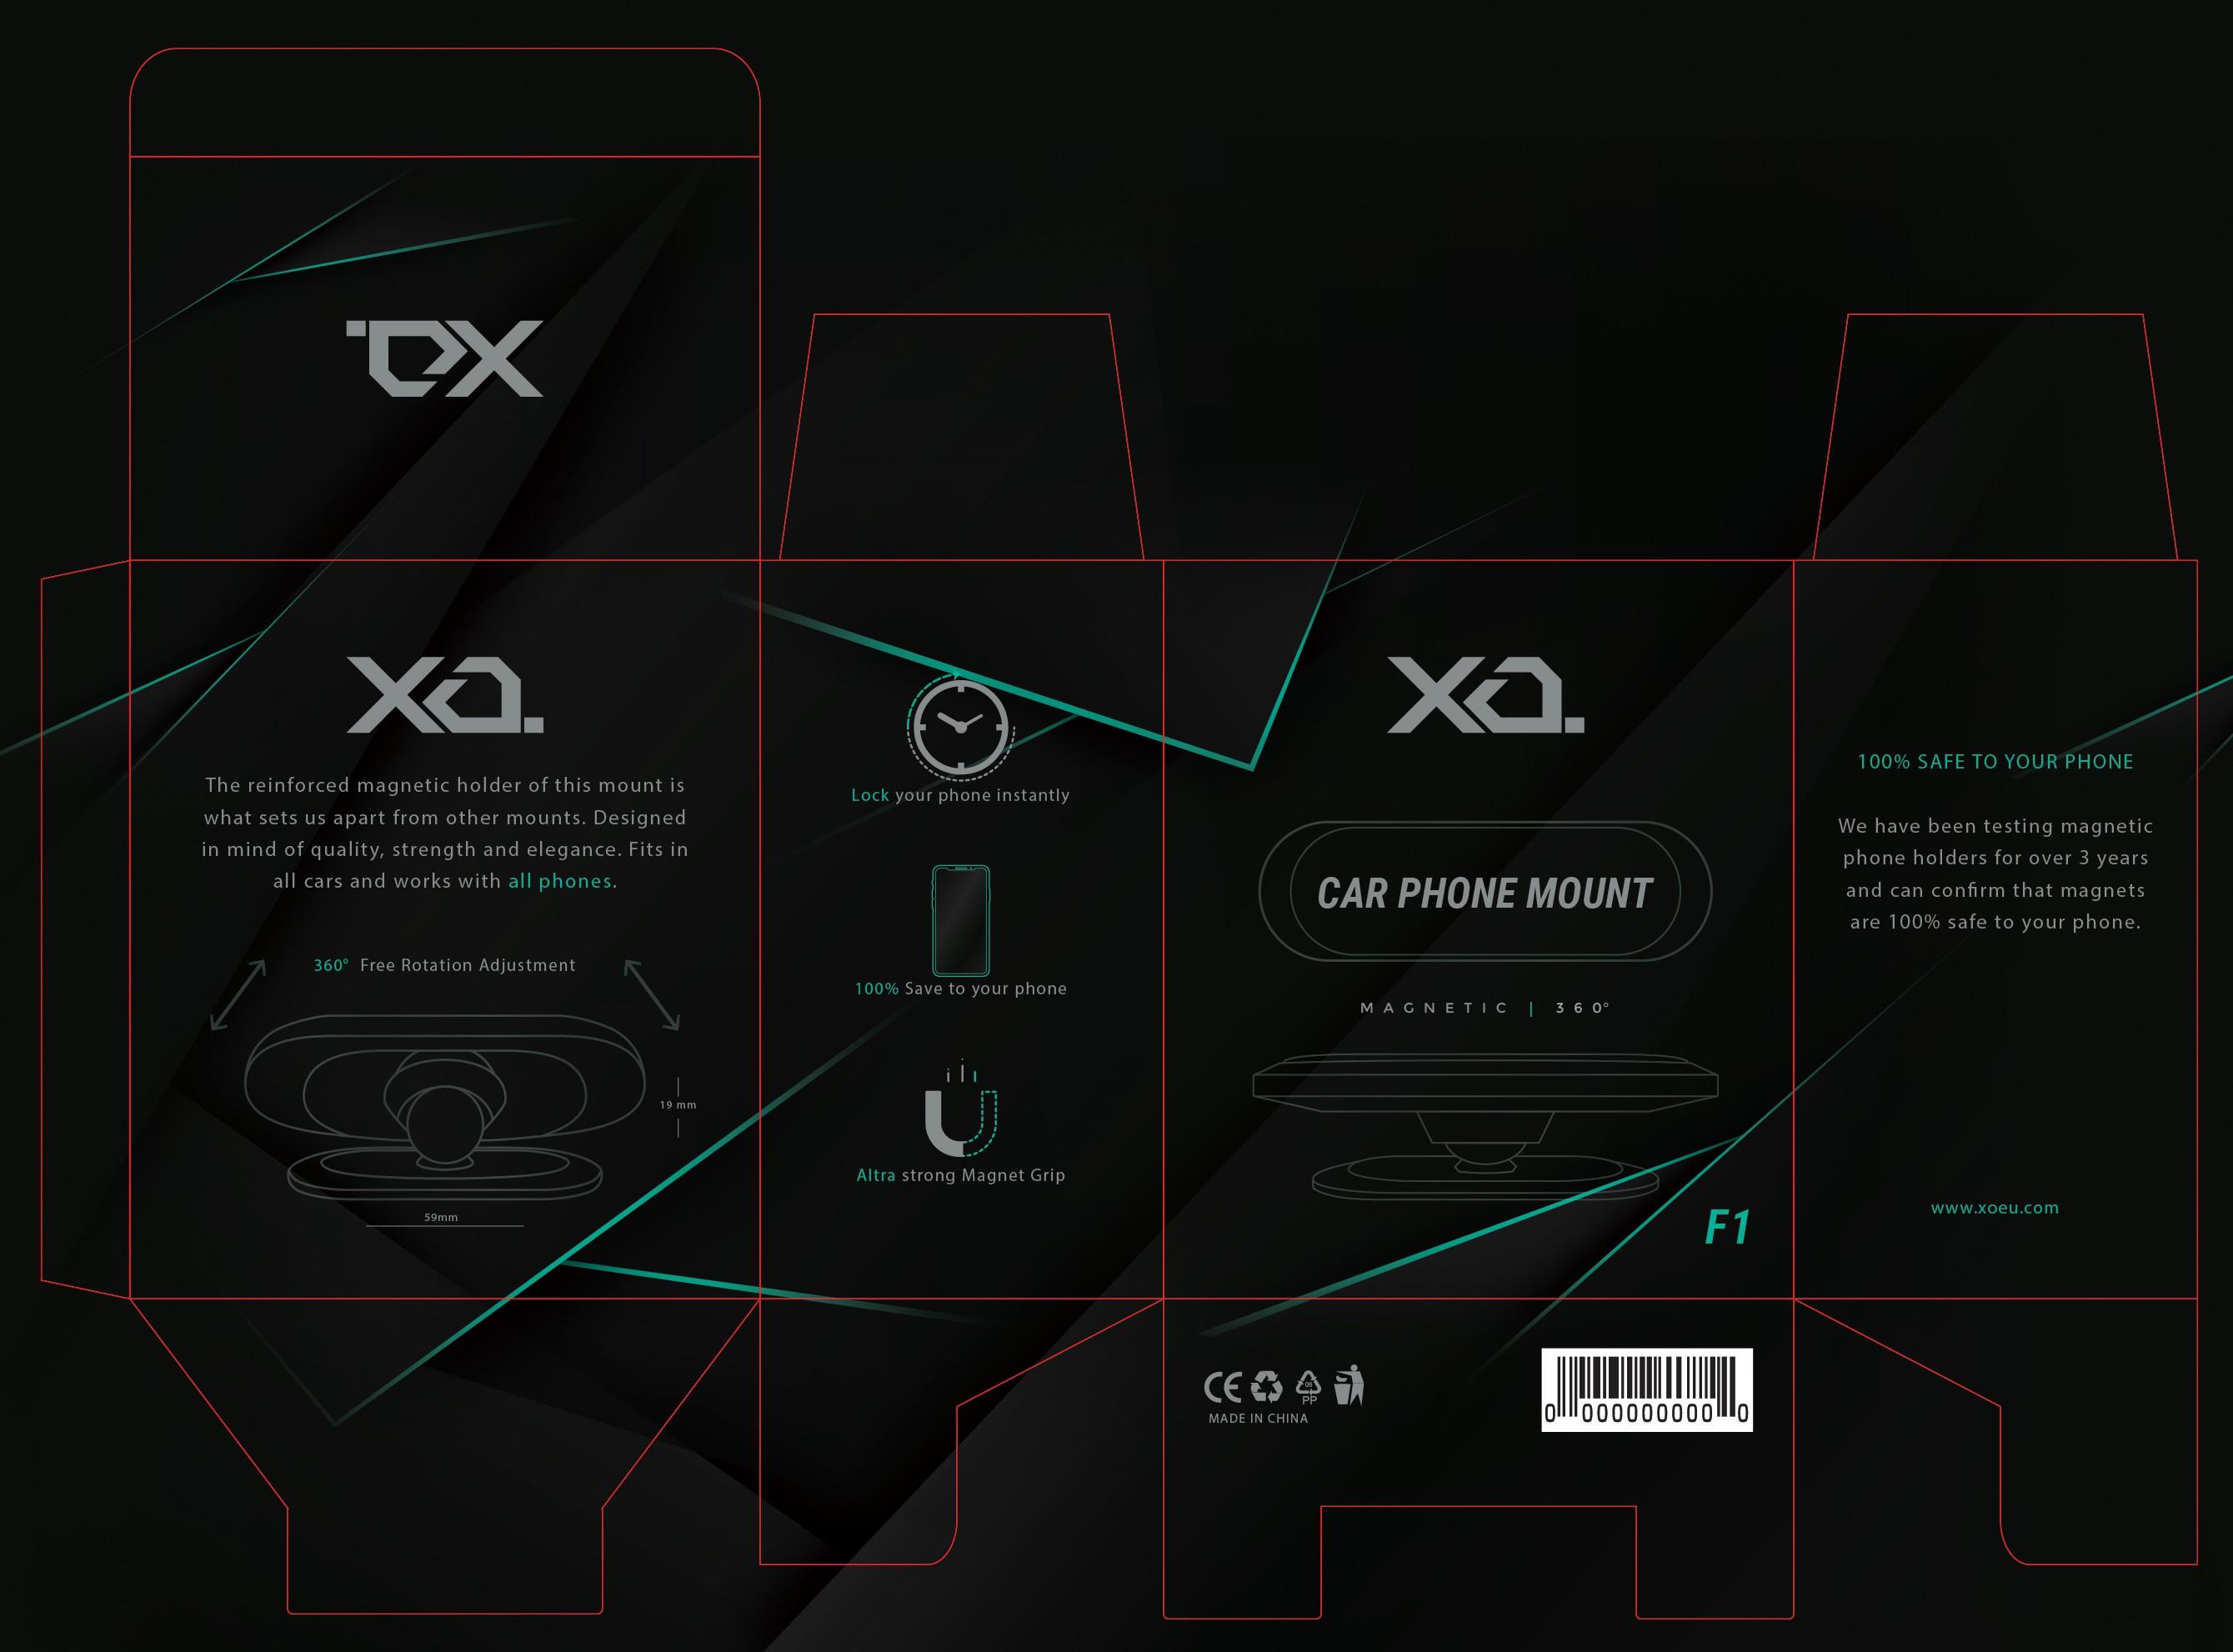 Minimal & Modern Package Design for Car Phone Holder